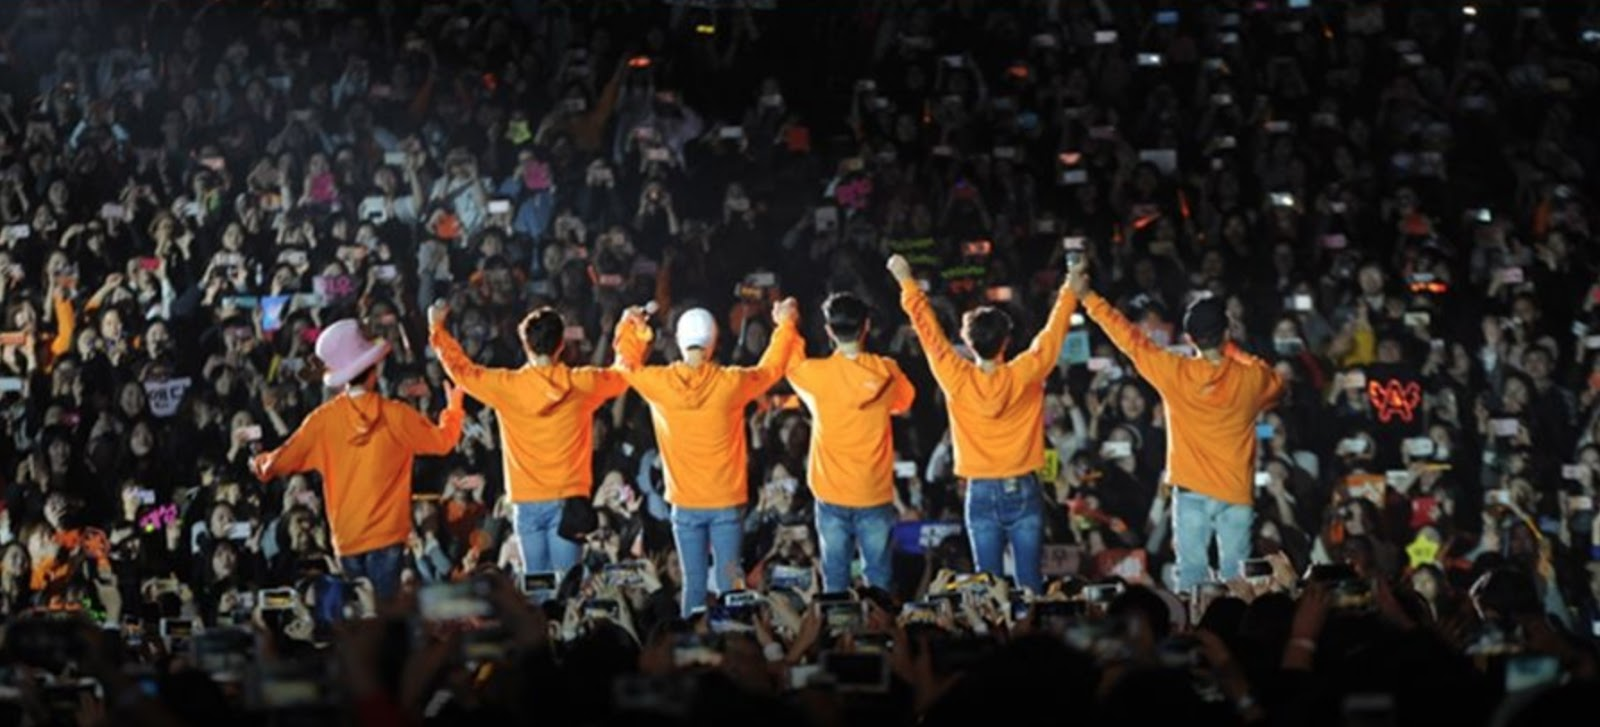 shinhwa 20 years fans